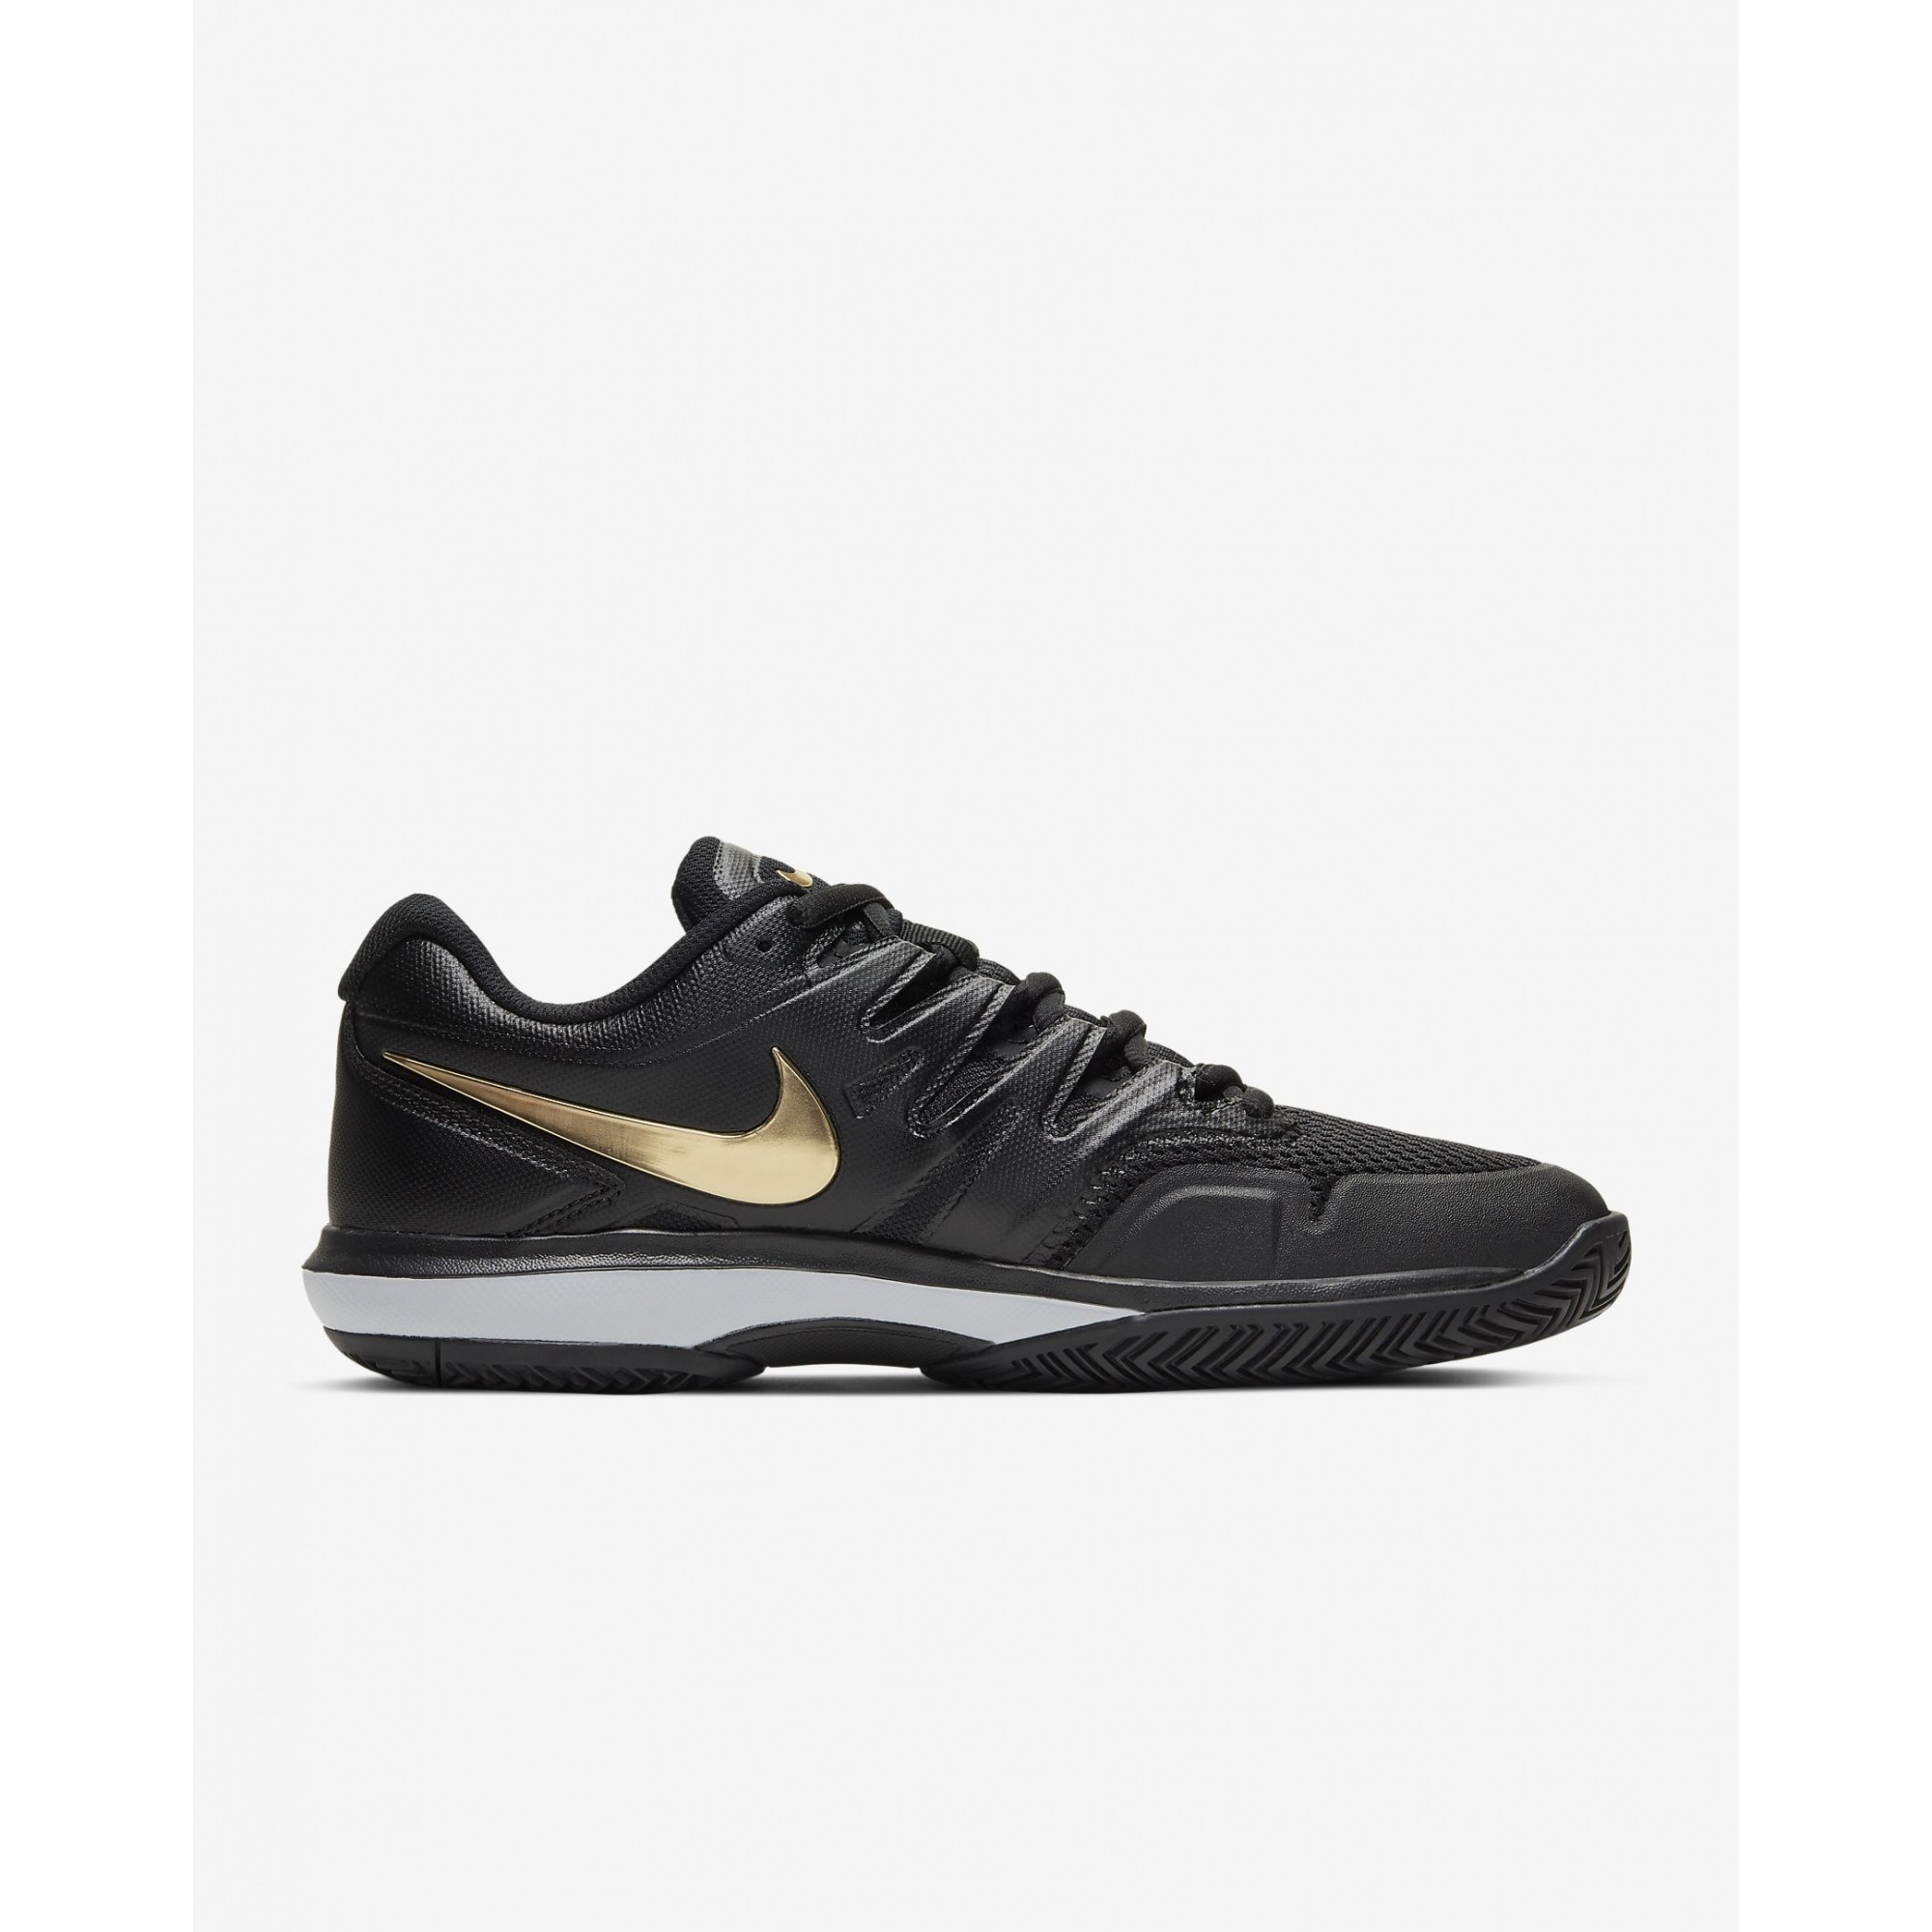 Tenis Nike AIR Zoom Prestige Preto e Dourado